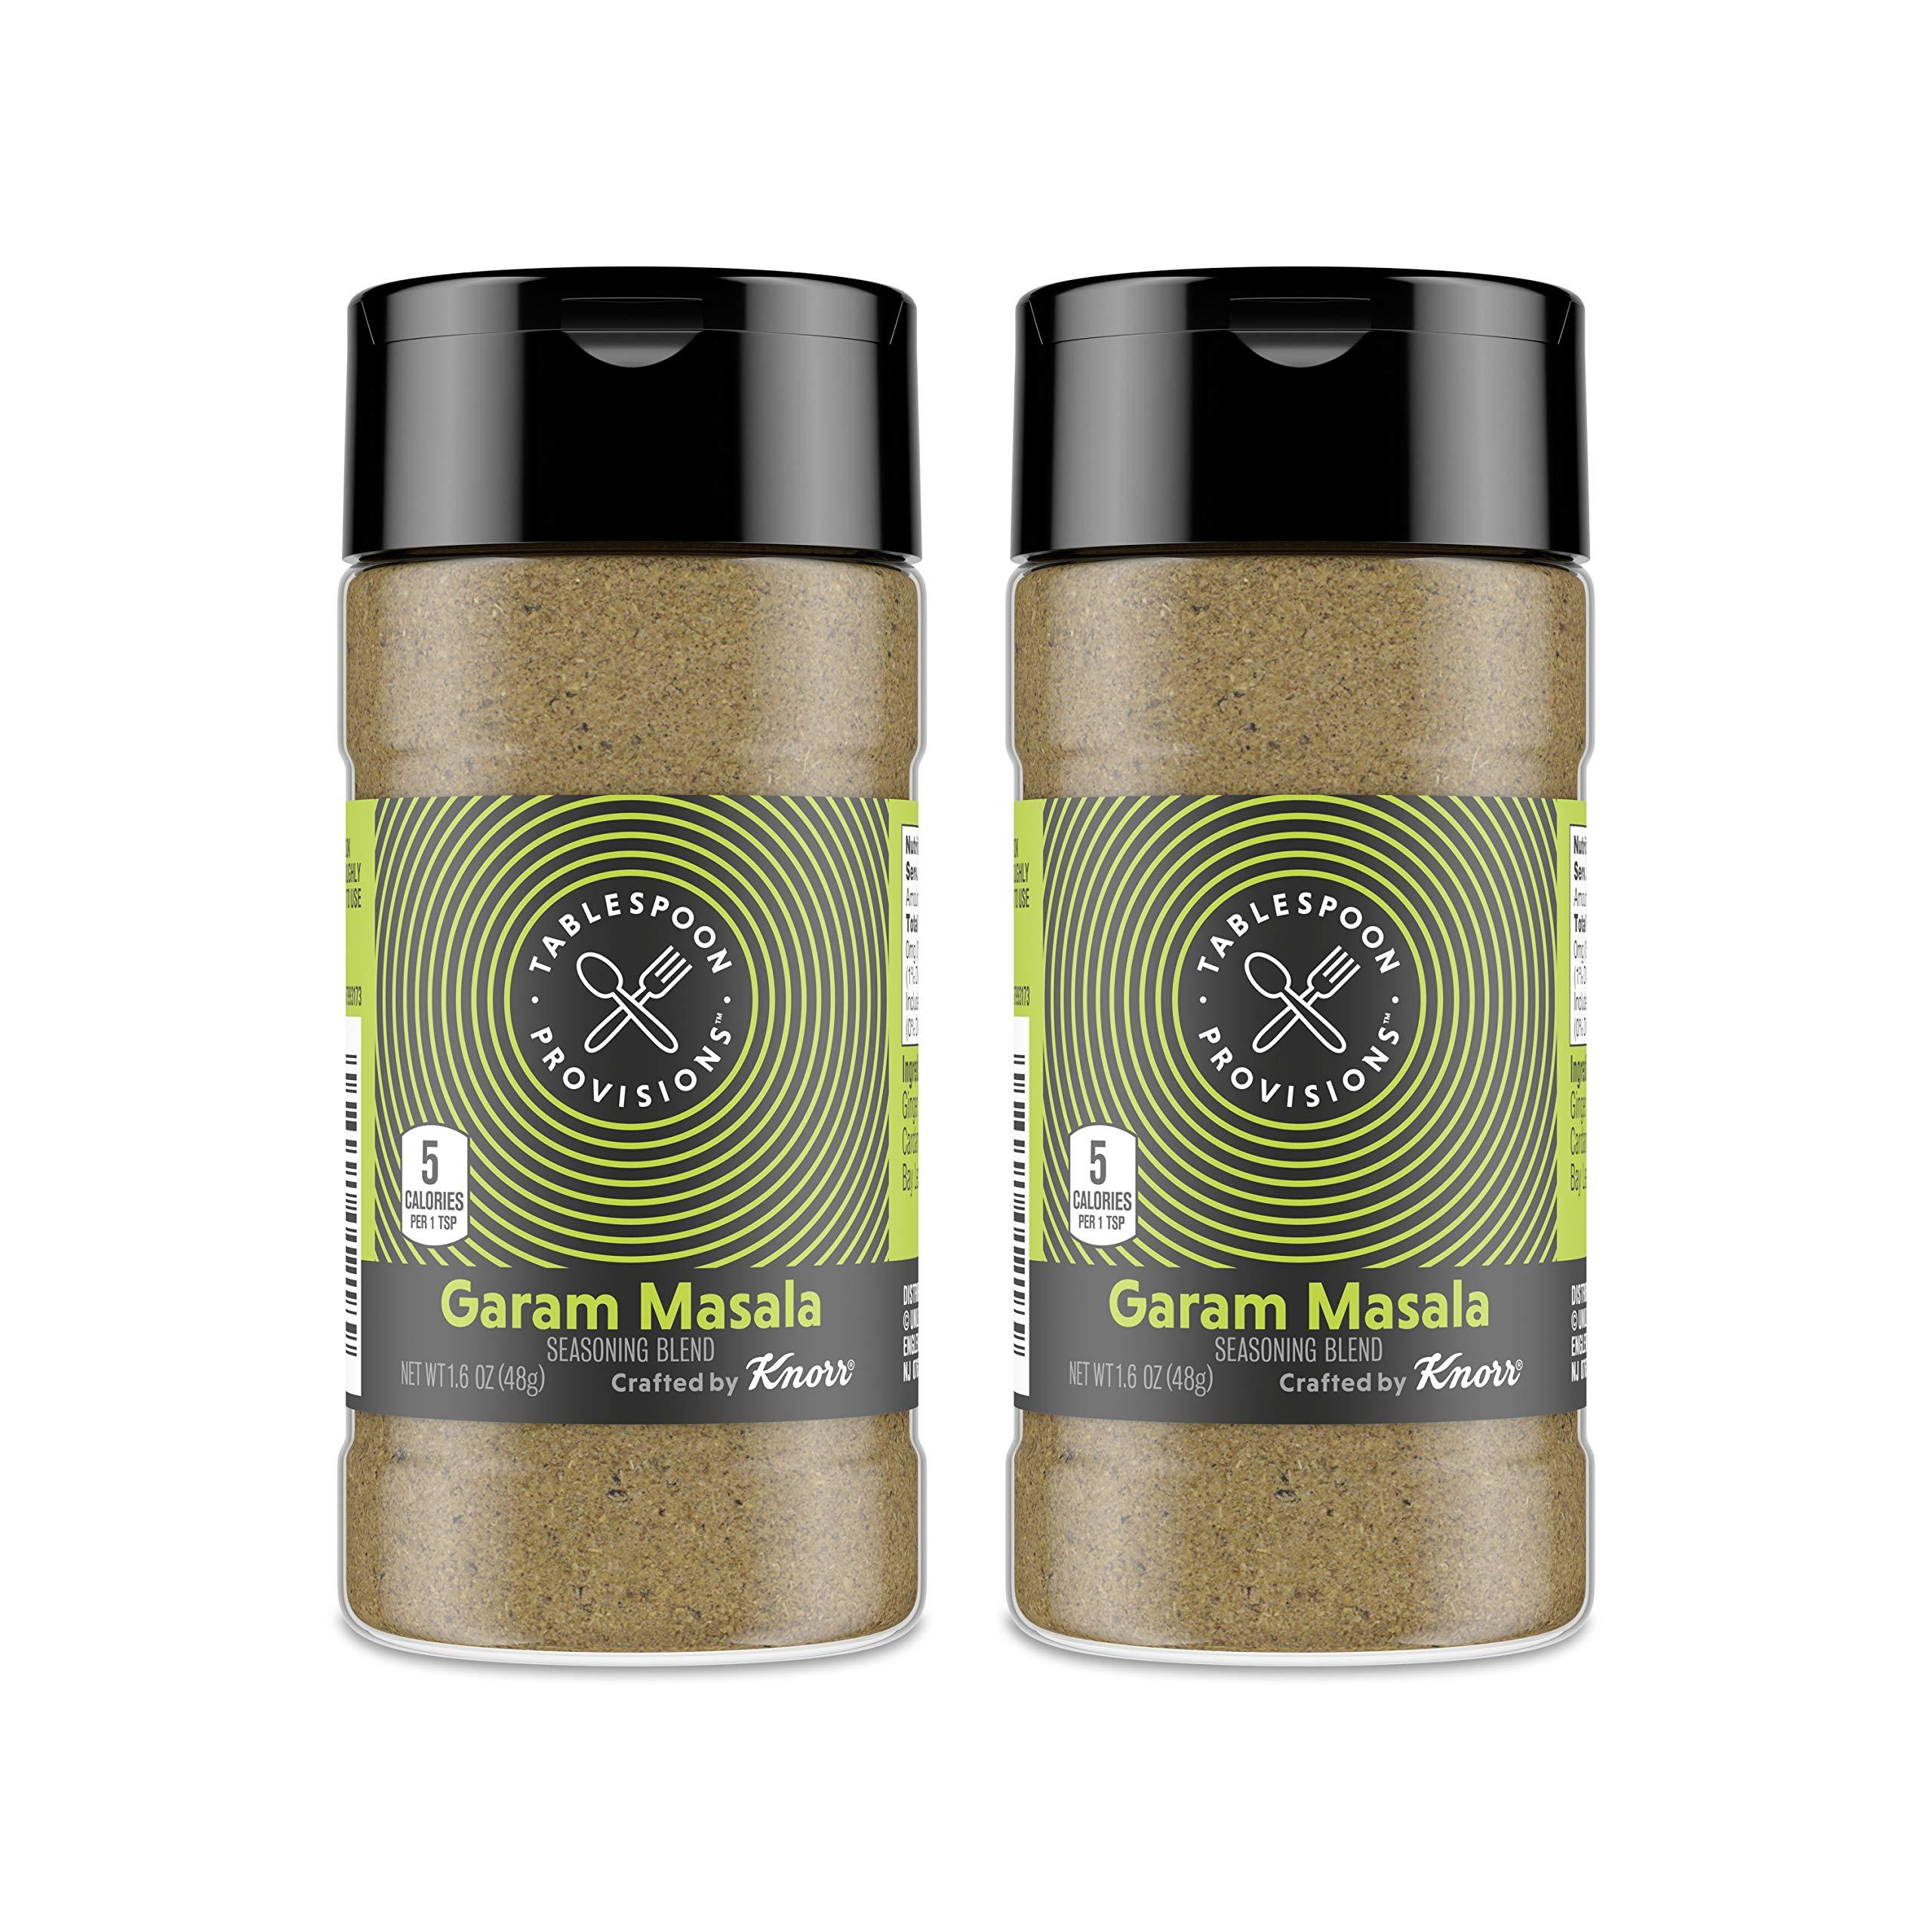 Tablespoon Provisions Garam Masala Seasoning, 3.2 oz (2 units, 1.6 oz each) - No Added Salt, No Artificial Preservatives, No Added MSG